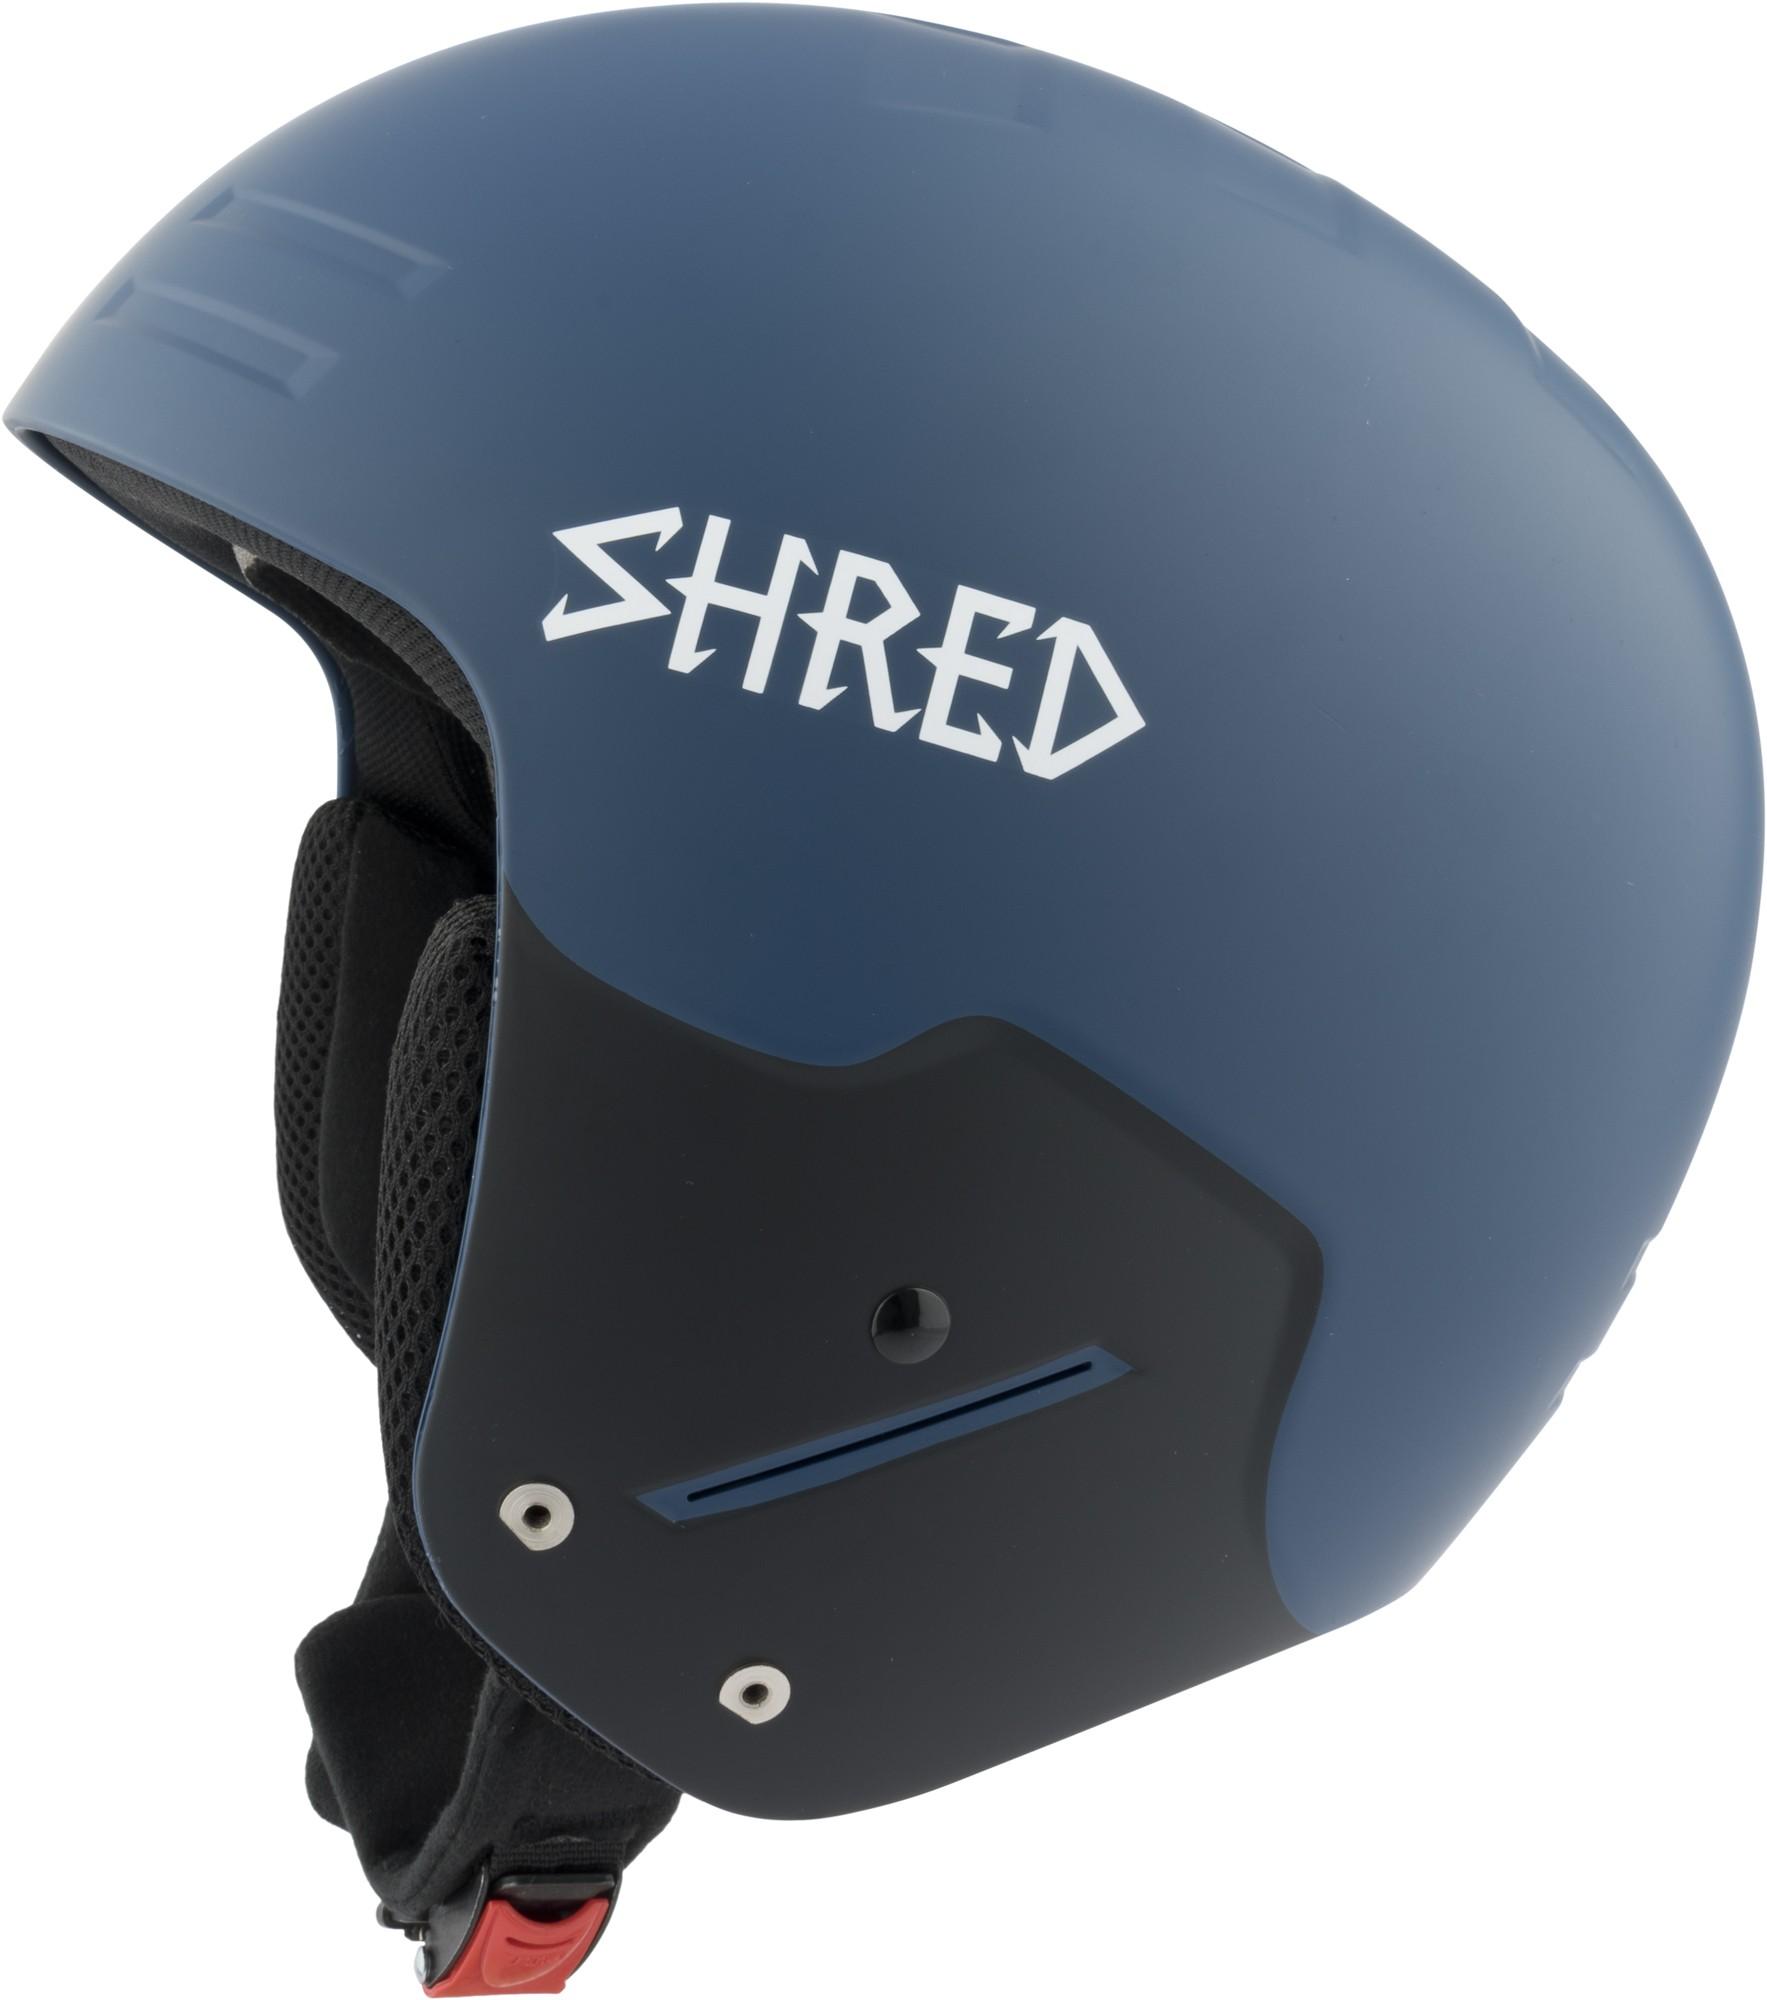 Shred FIS BASHER NoShock Grab ski helmet, 2018